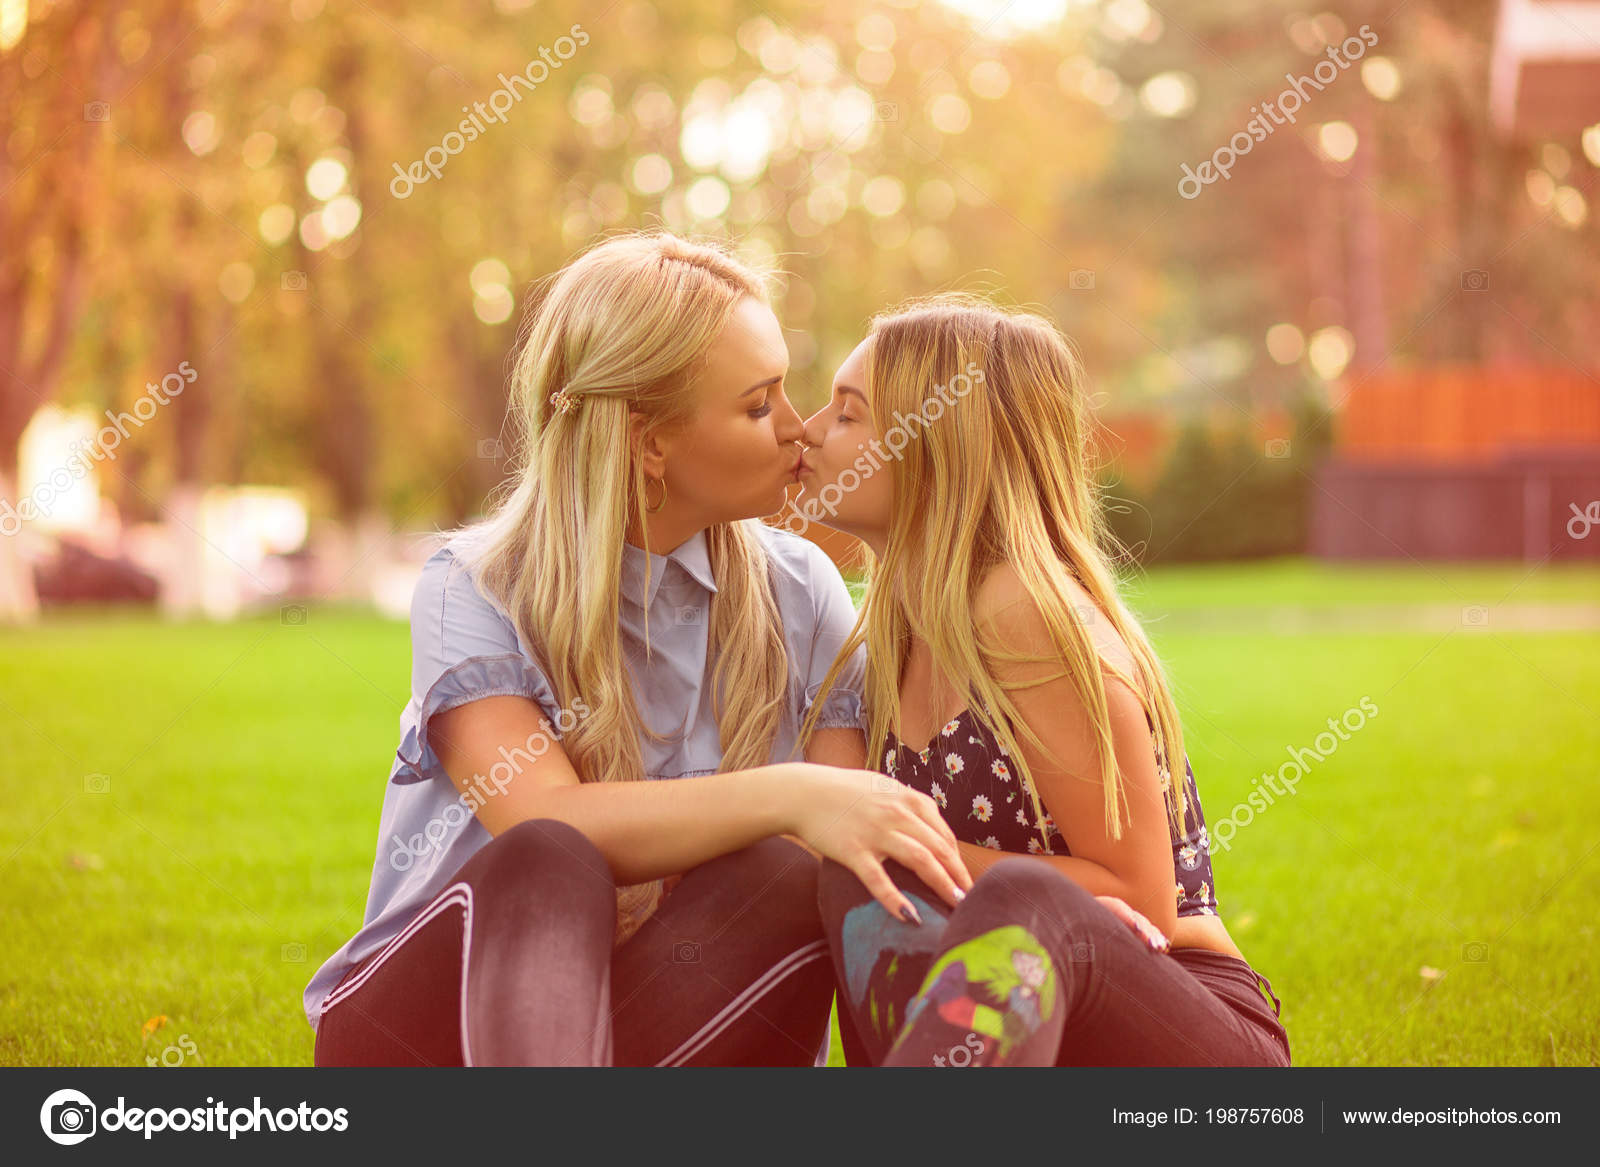 Women teen kissing for that